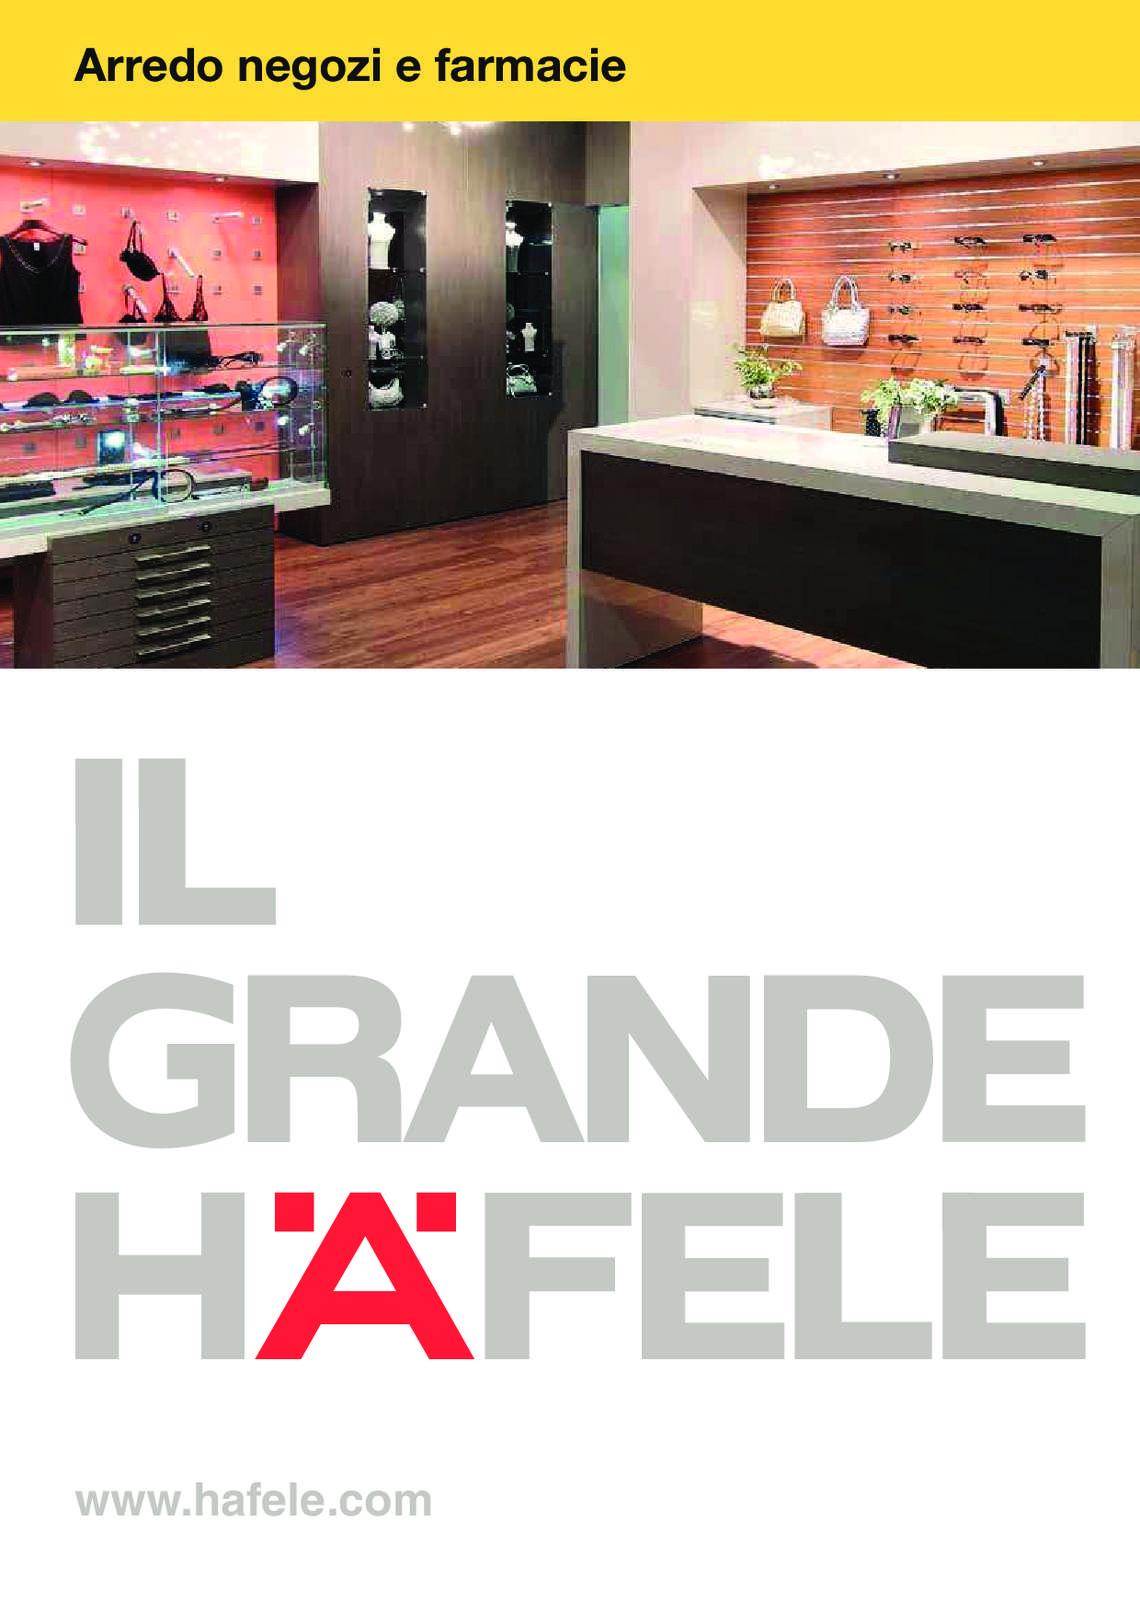 Hafele: Arredo negozi e farmacie